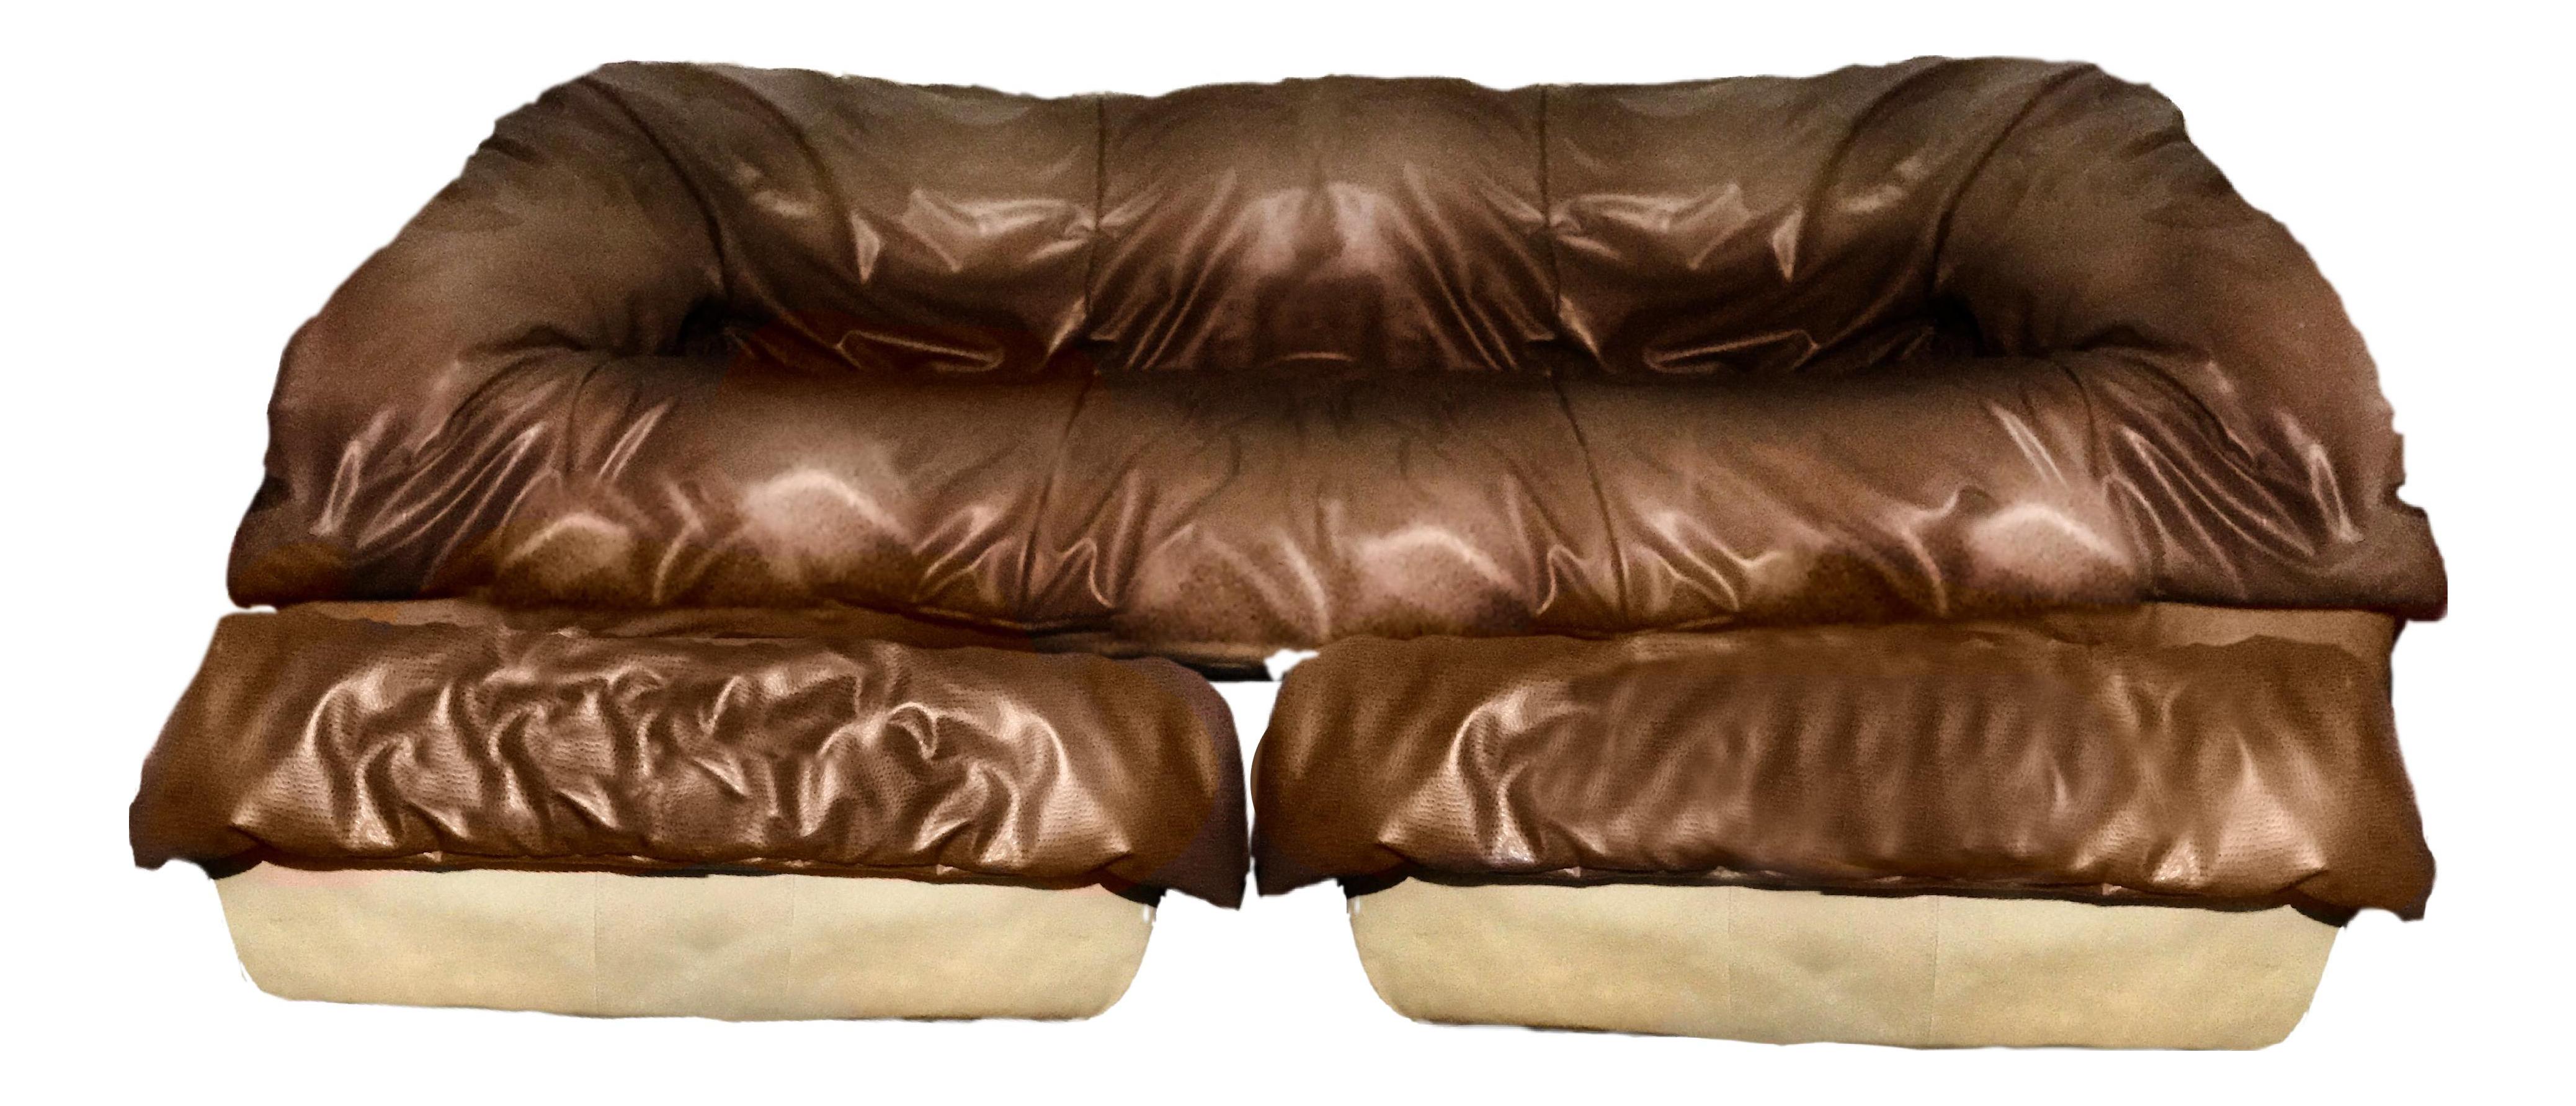 urbino sofa covers. Black Bedroom Furniture Sets. Home Design Ideas